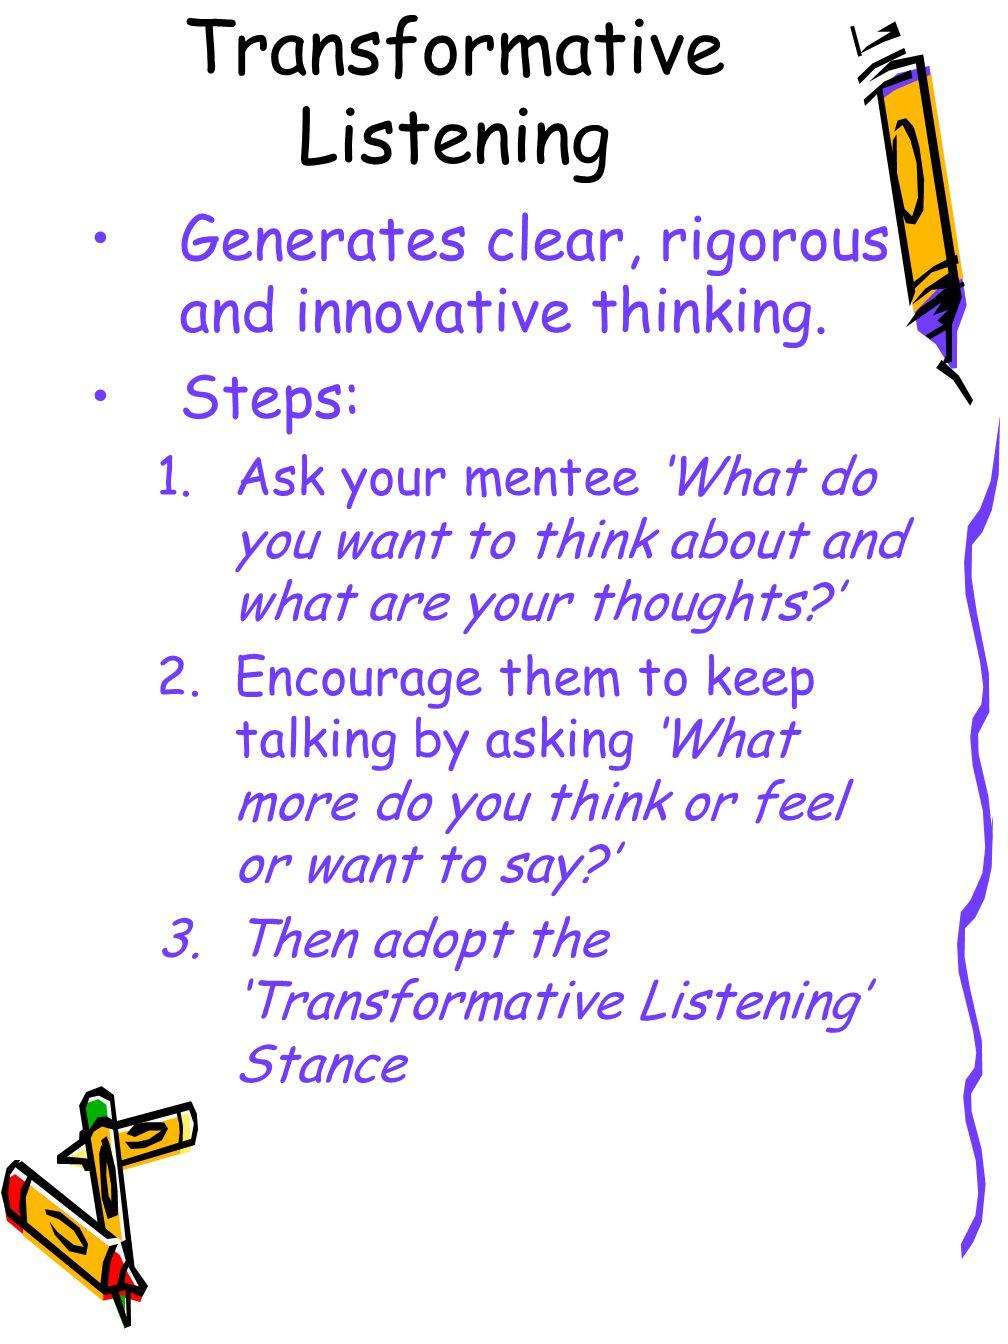 Transformative Listening Generates clear, rigorous and innovative thinking.